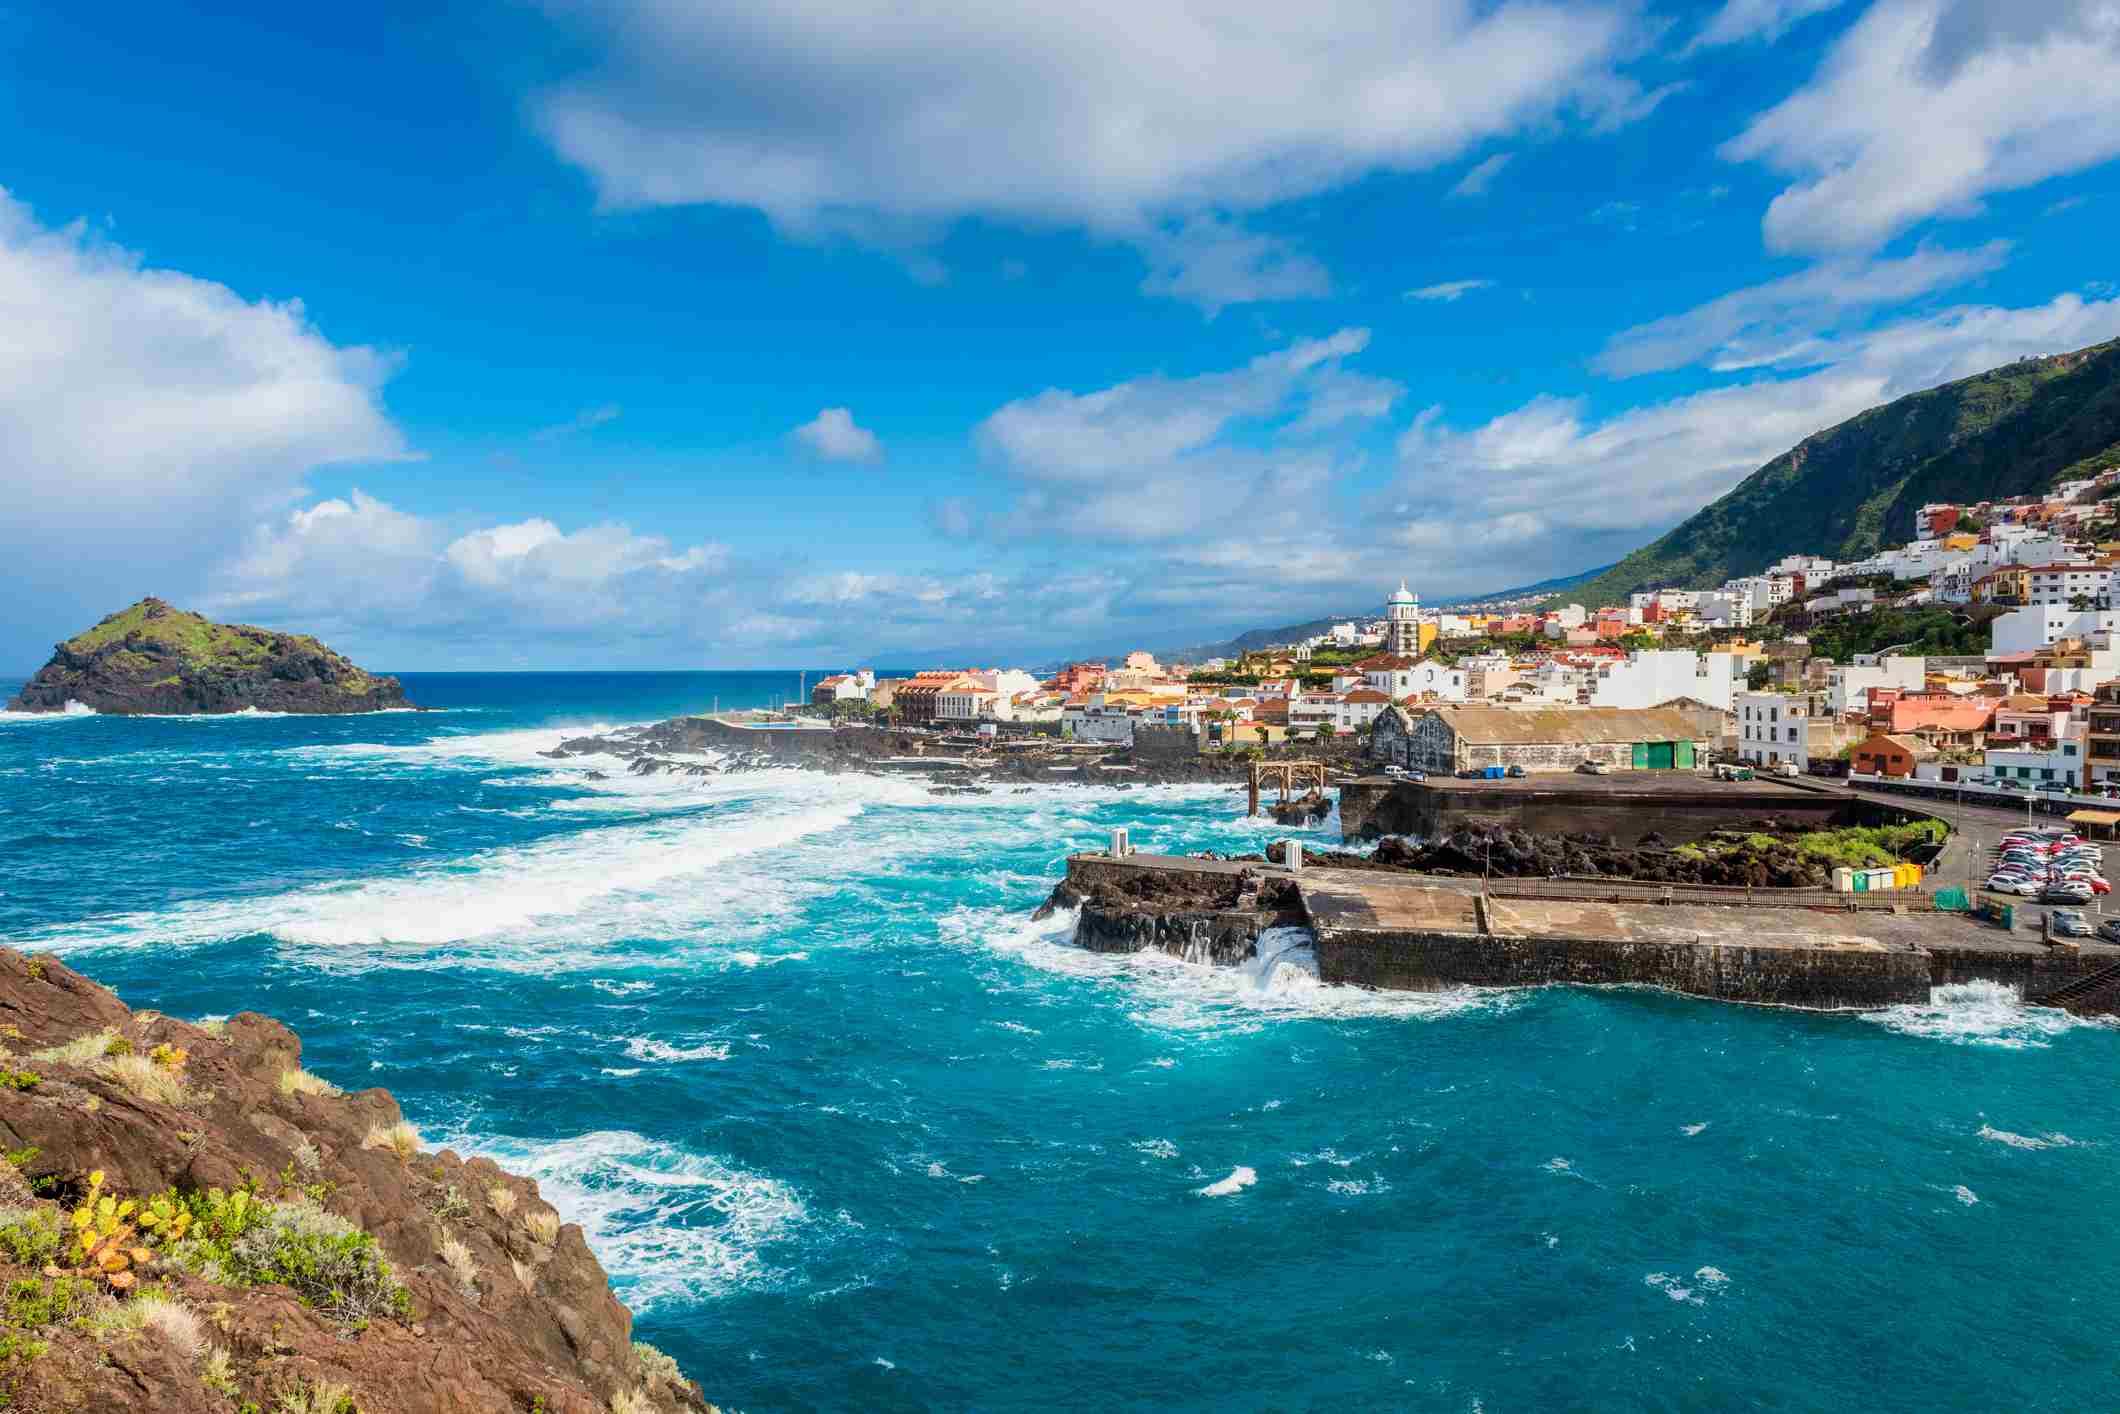 Coastal village of Garachico Tenerife